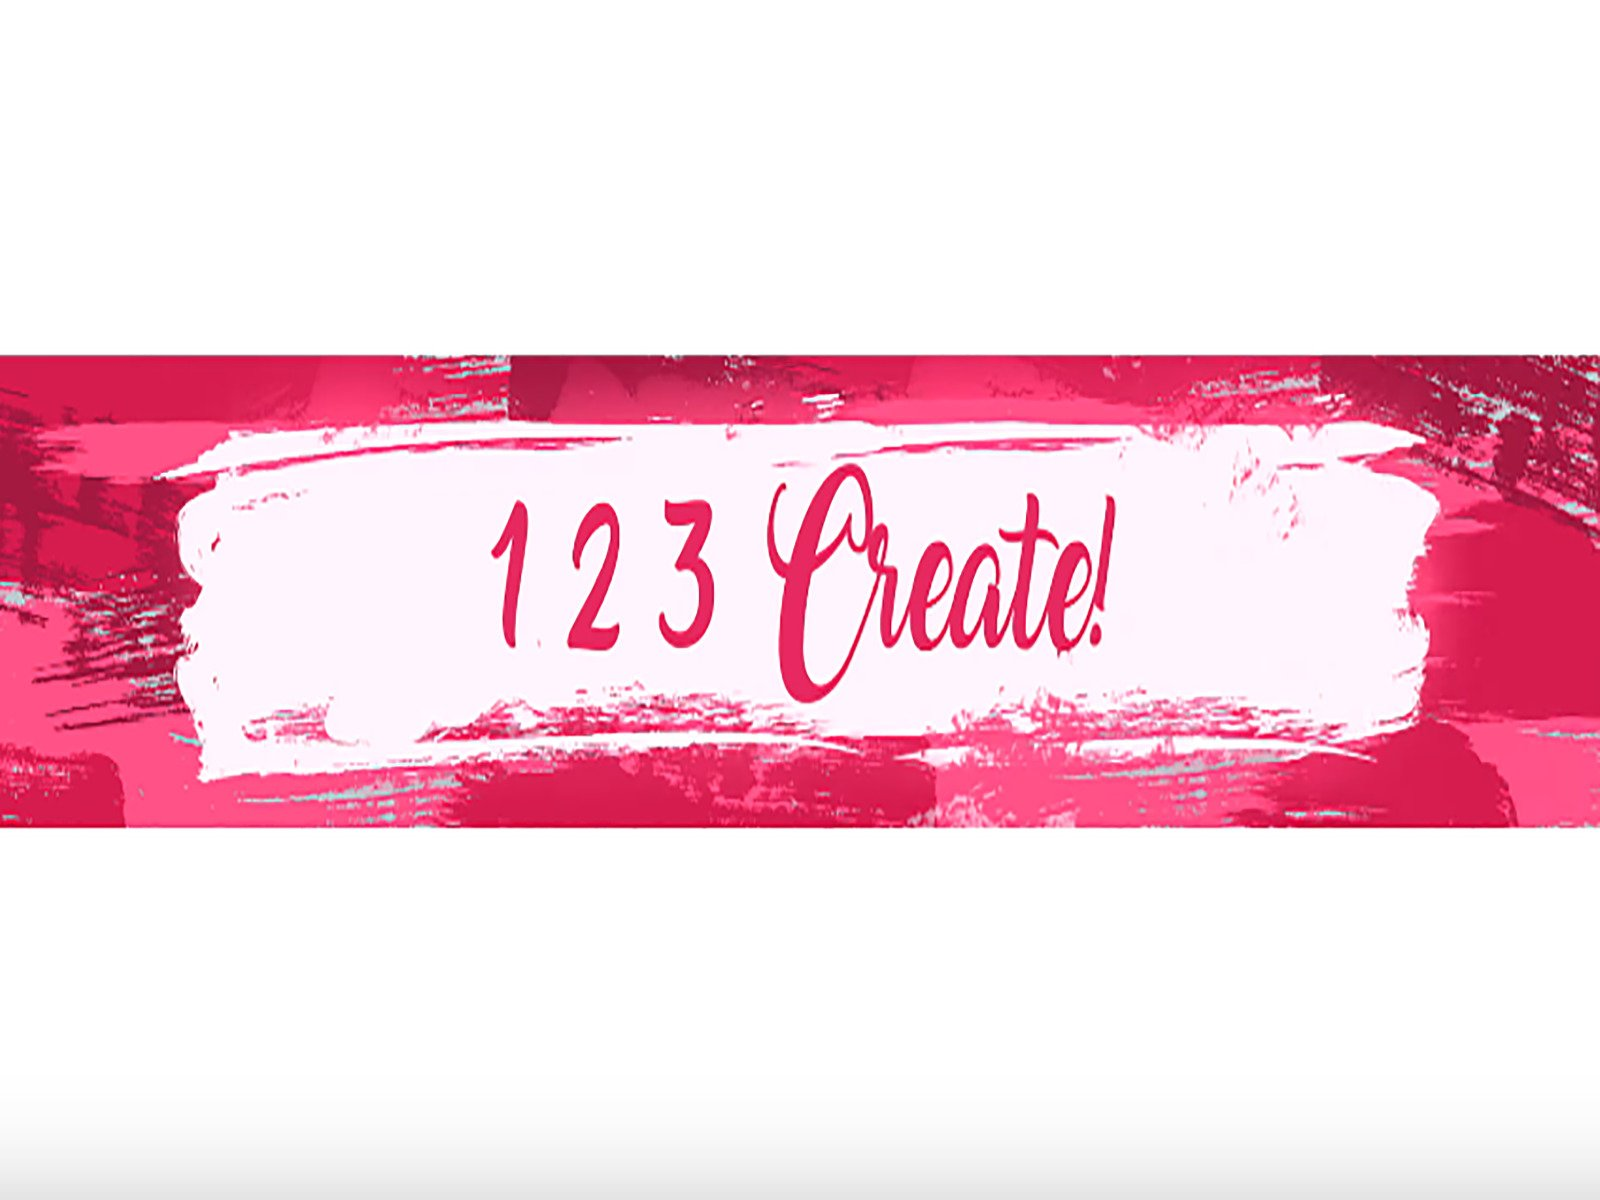 1 2 3 Create